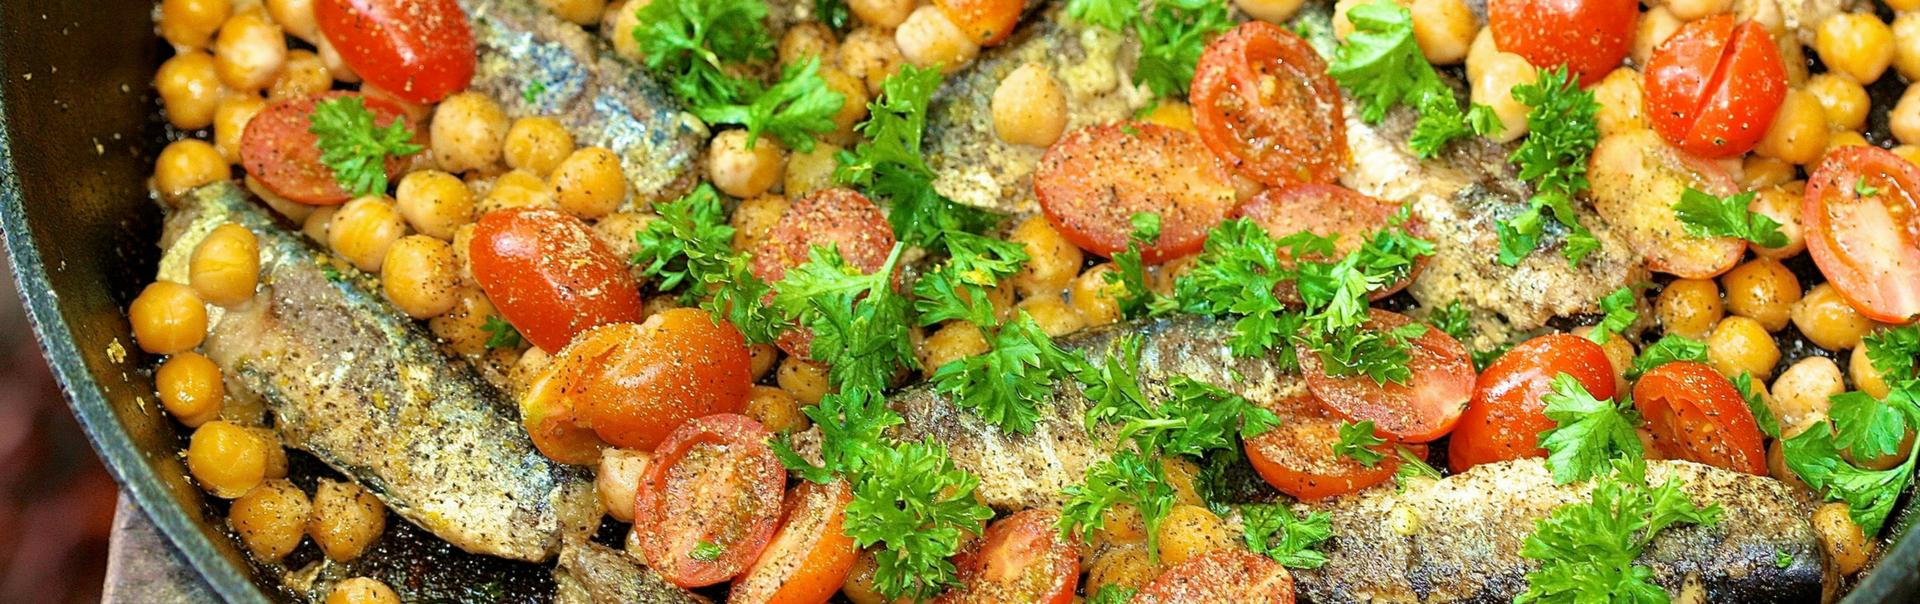 Sardines with chickpeas, lemon & parsley